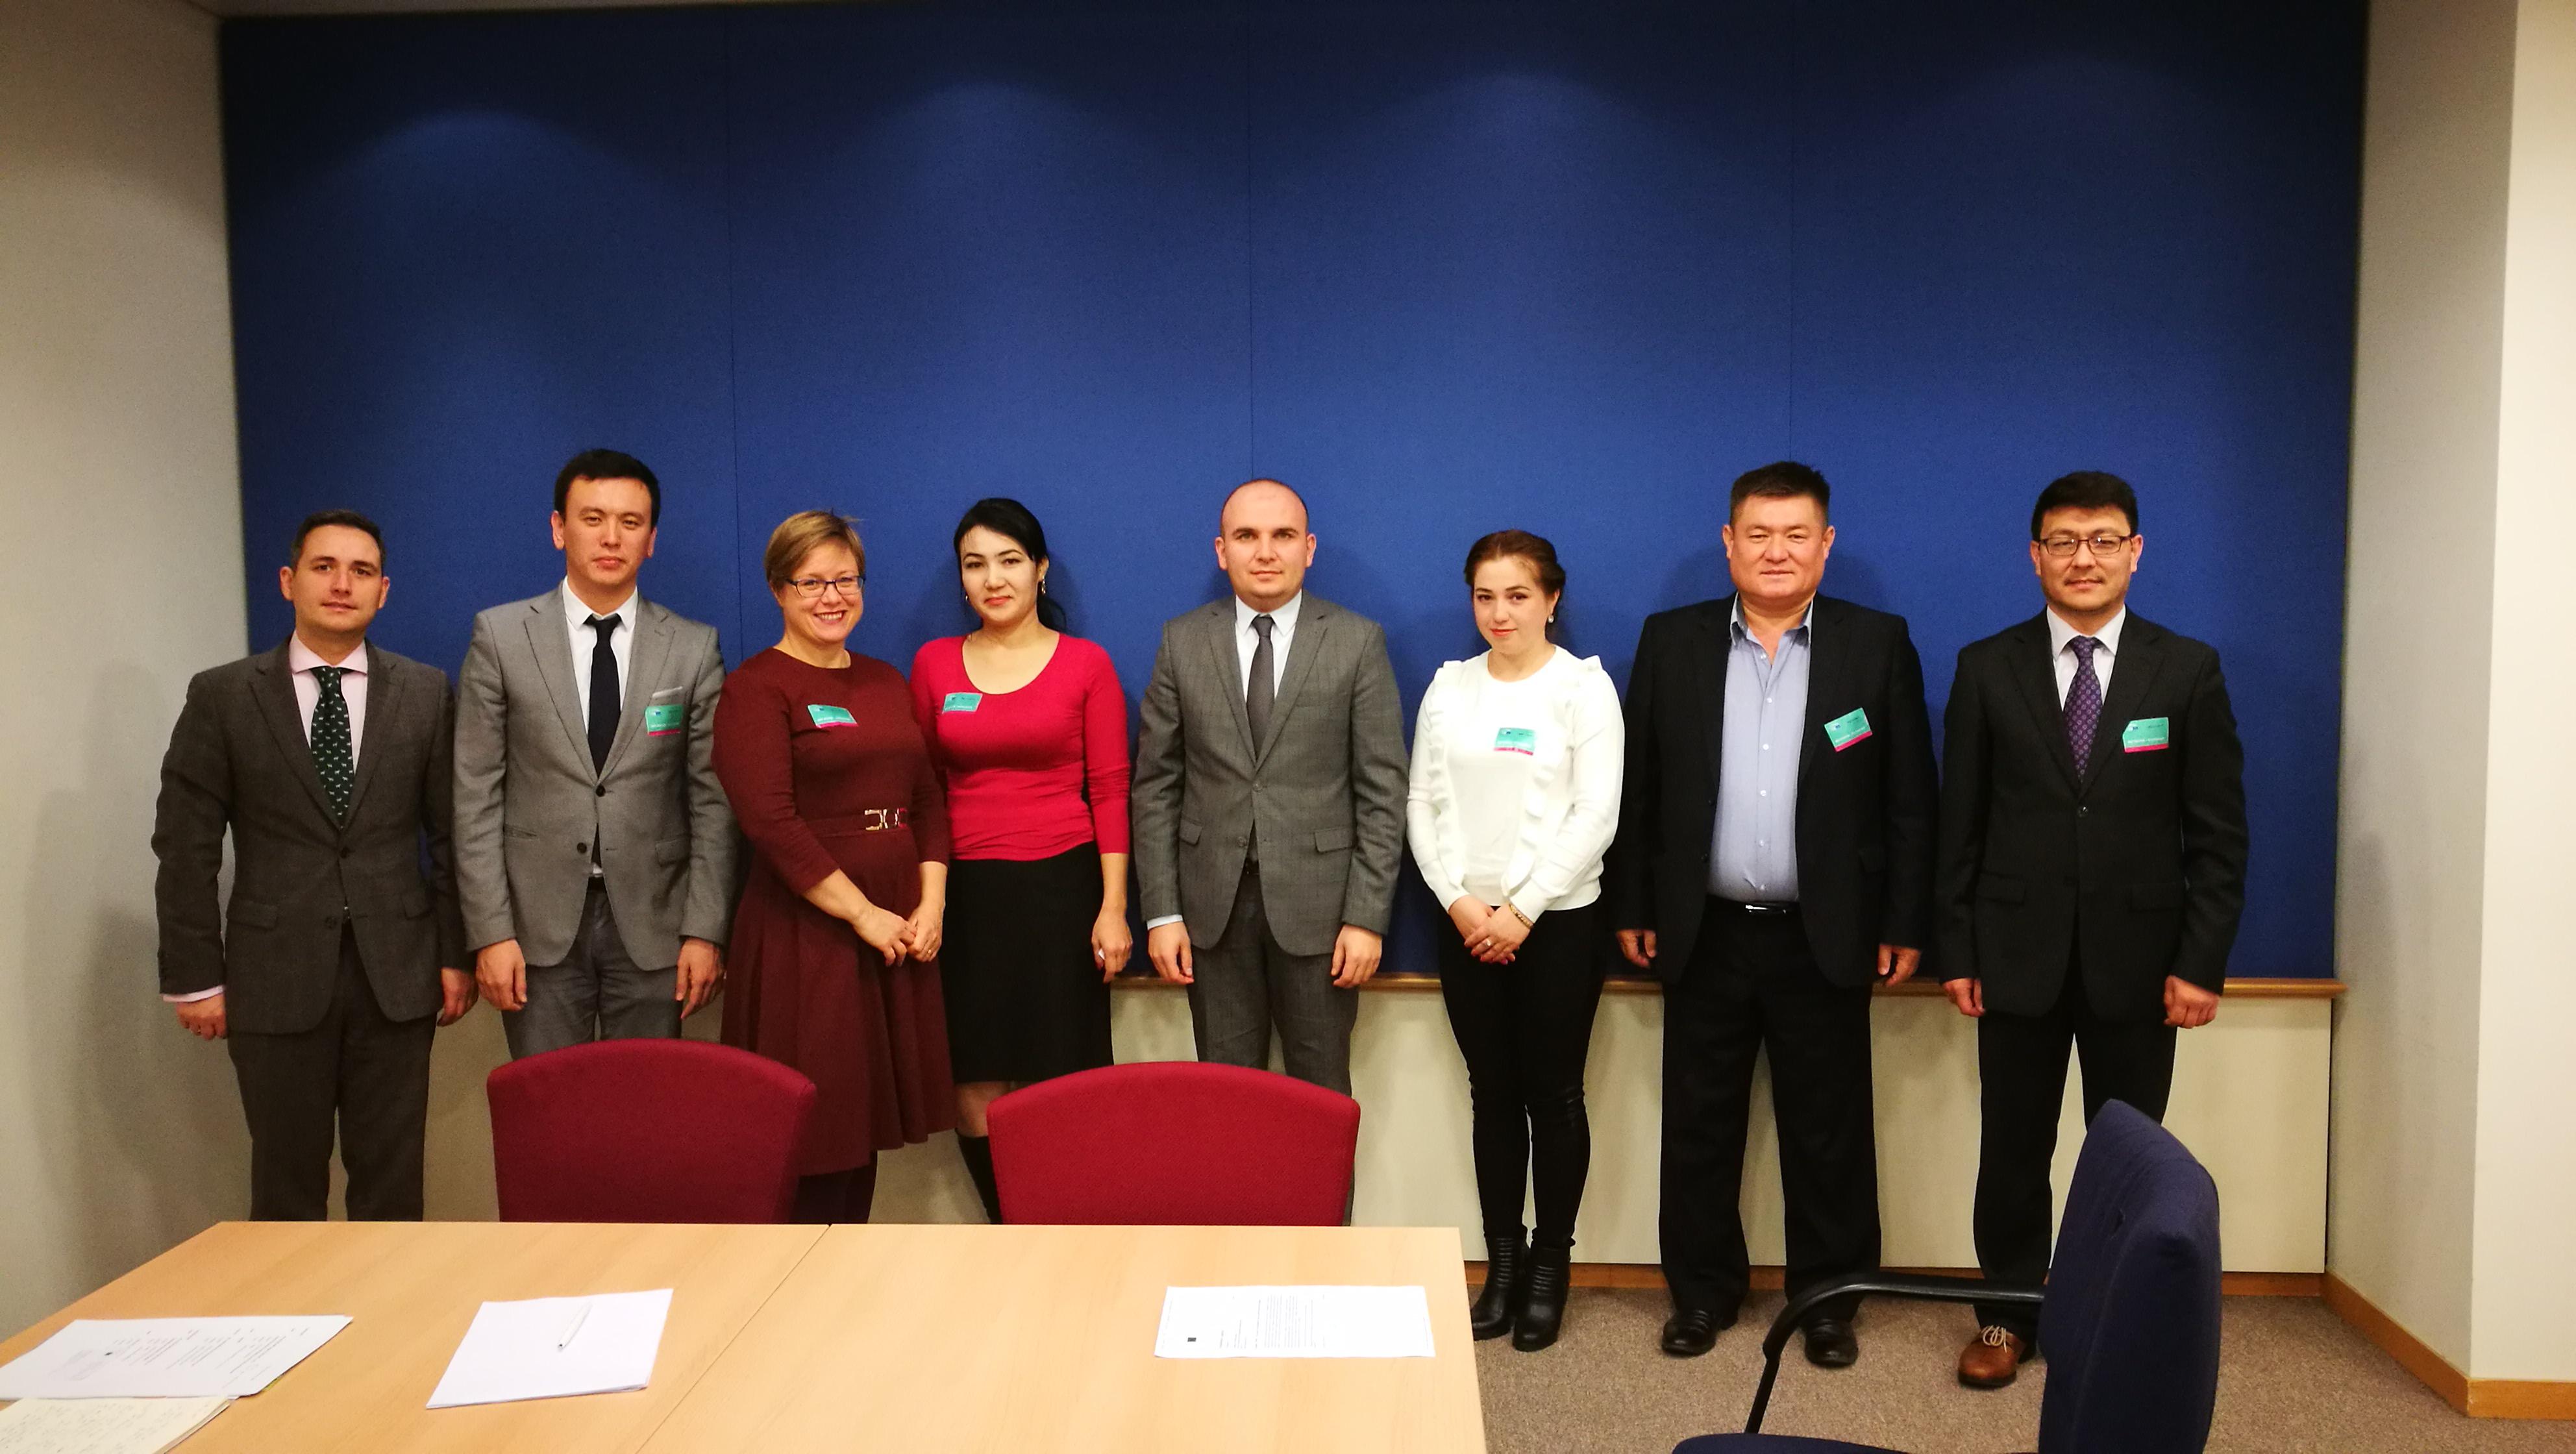 Ilhan Kyuchyuk met with representatives of the civil society in Uzbekistan